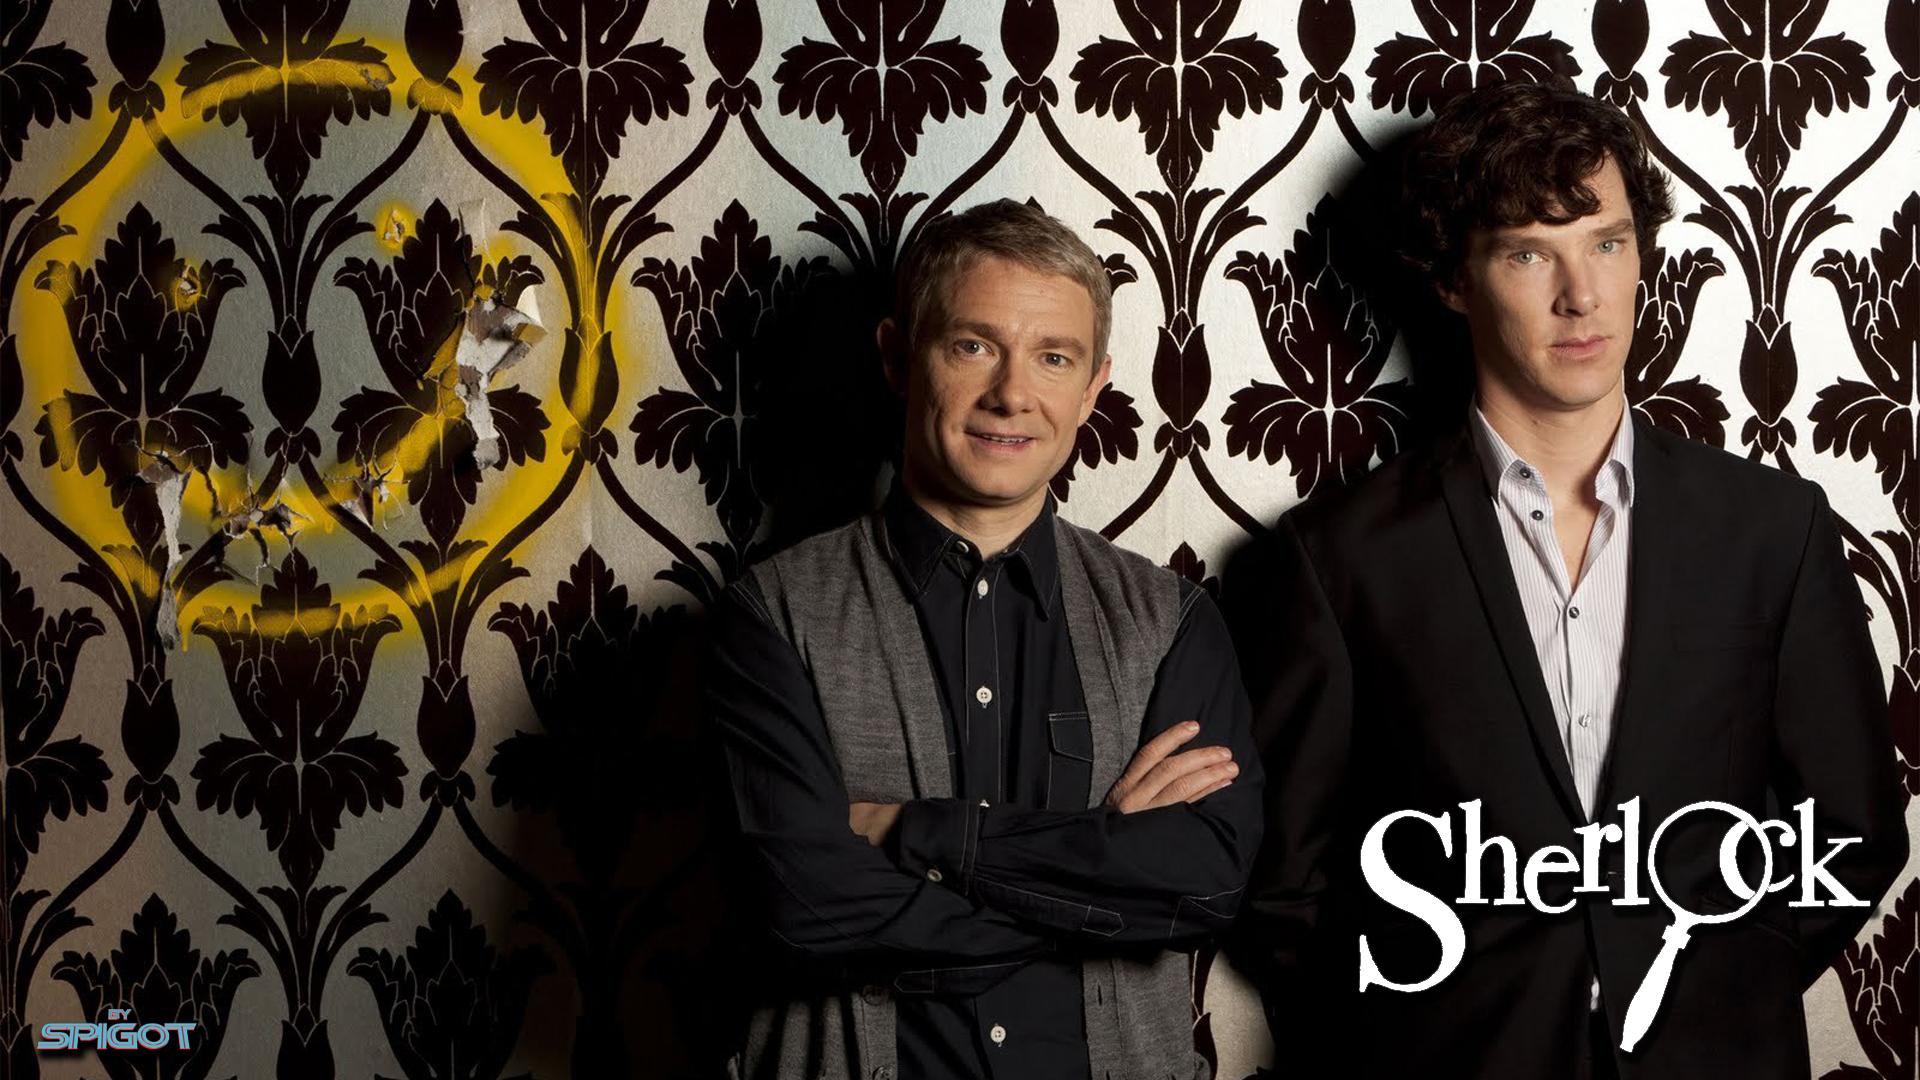 wallpapers sherlock holmes bbc - photo #22